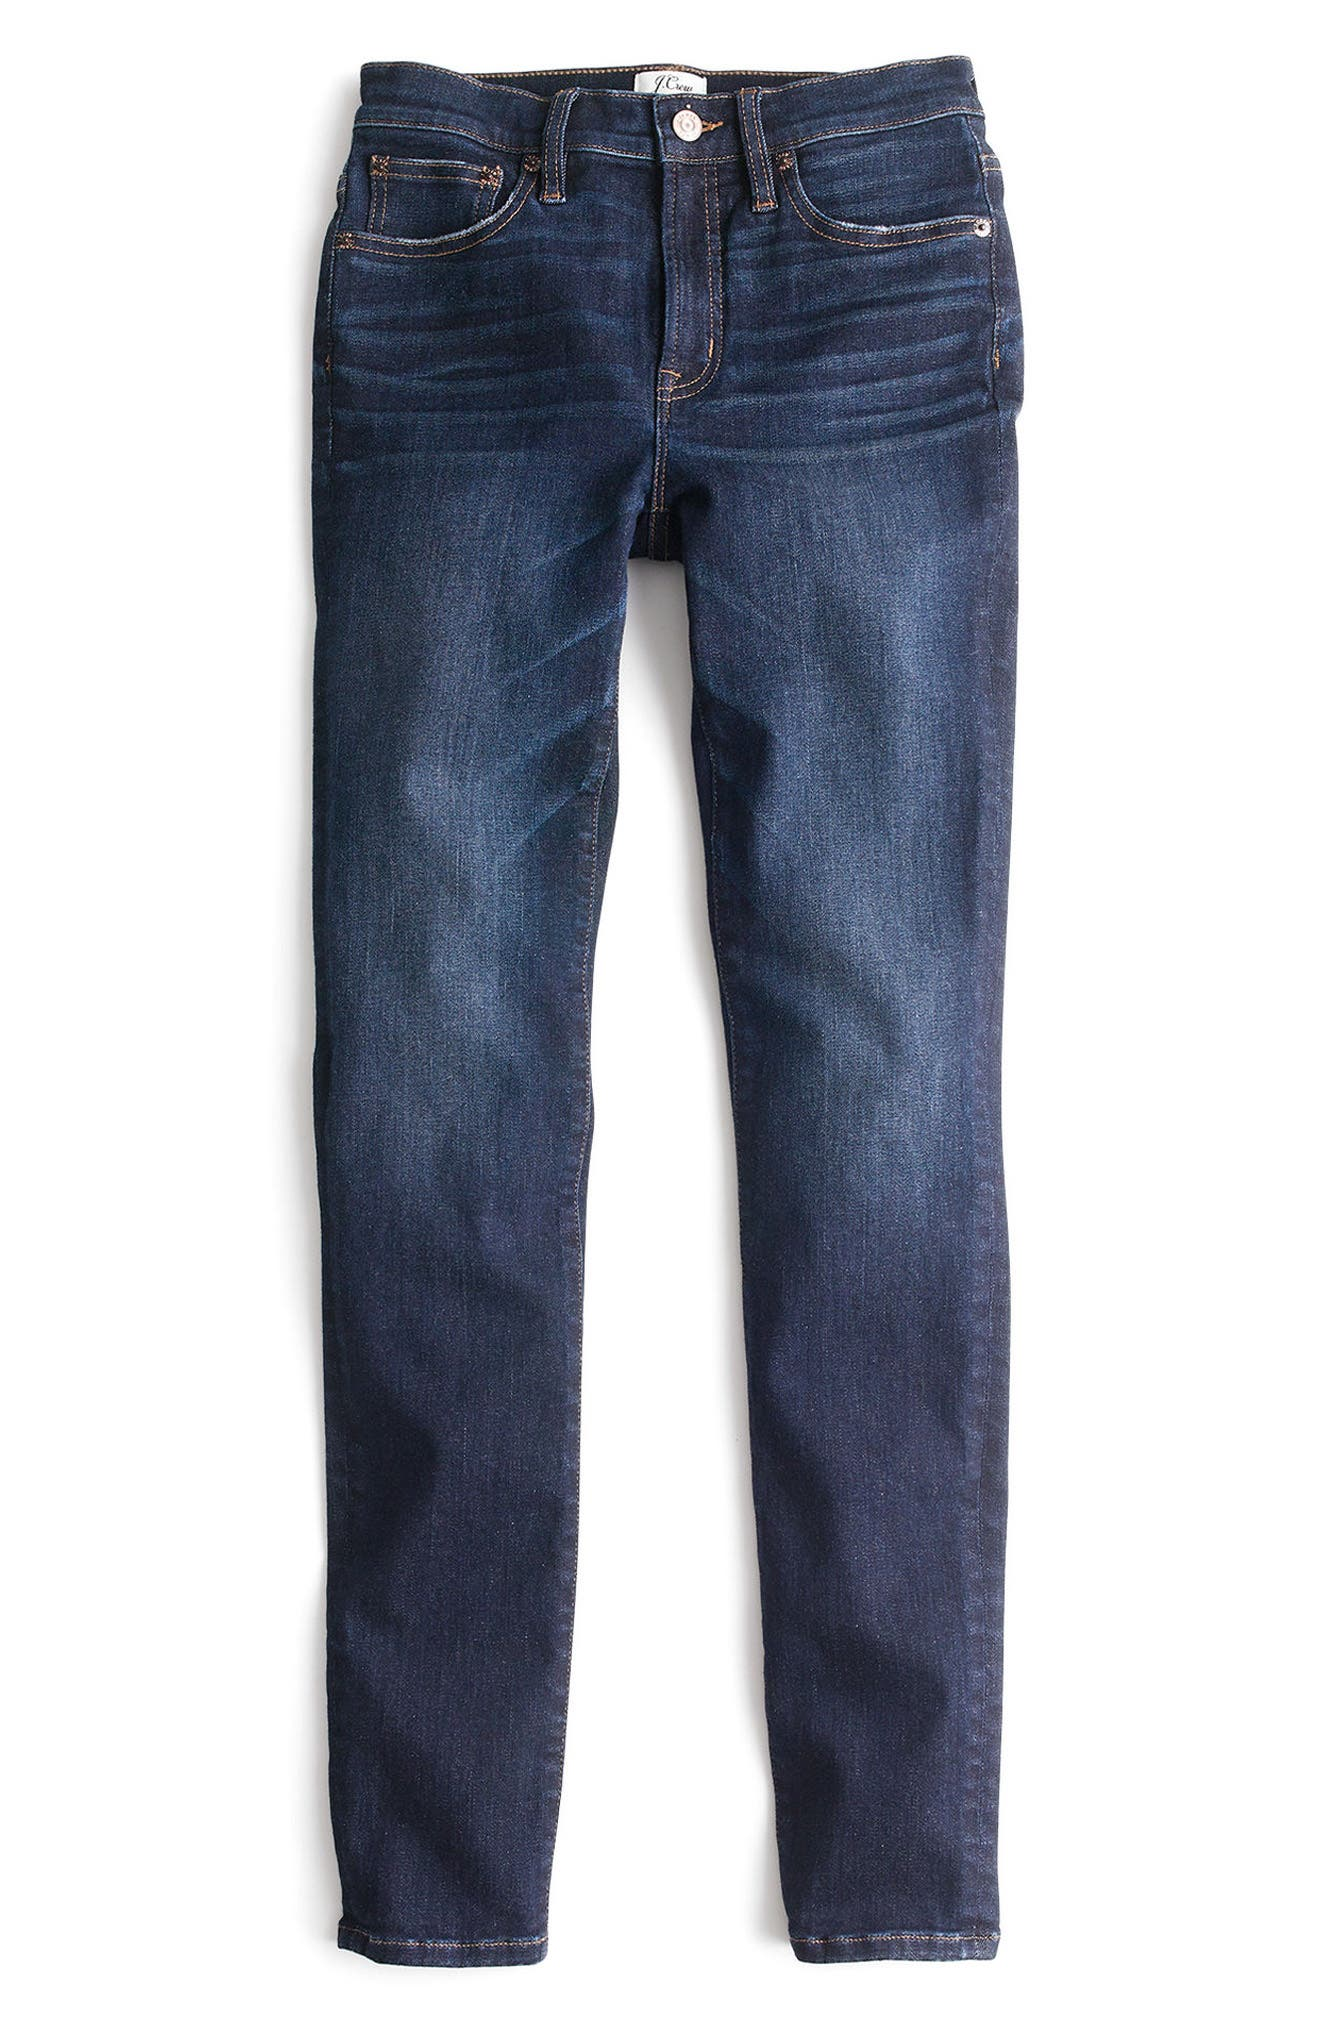 J.Crew High Rise Toothpick Jeans (Solano) (Regular & Petite)